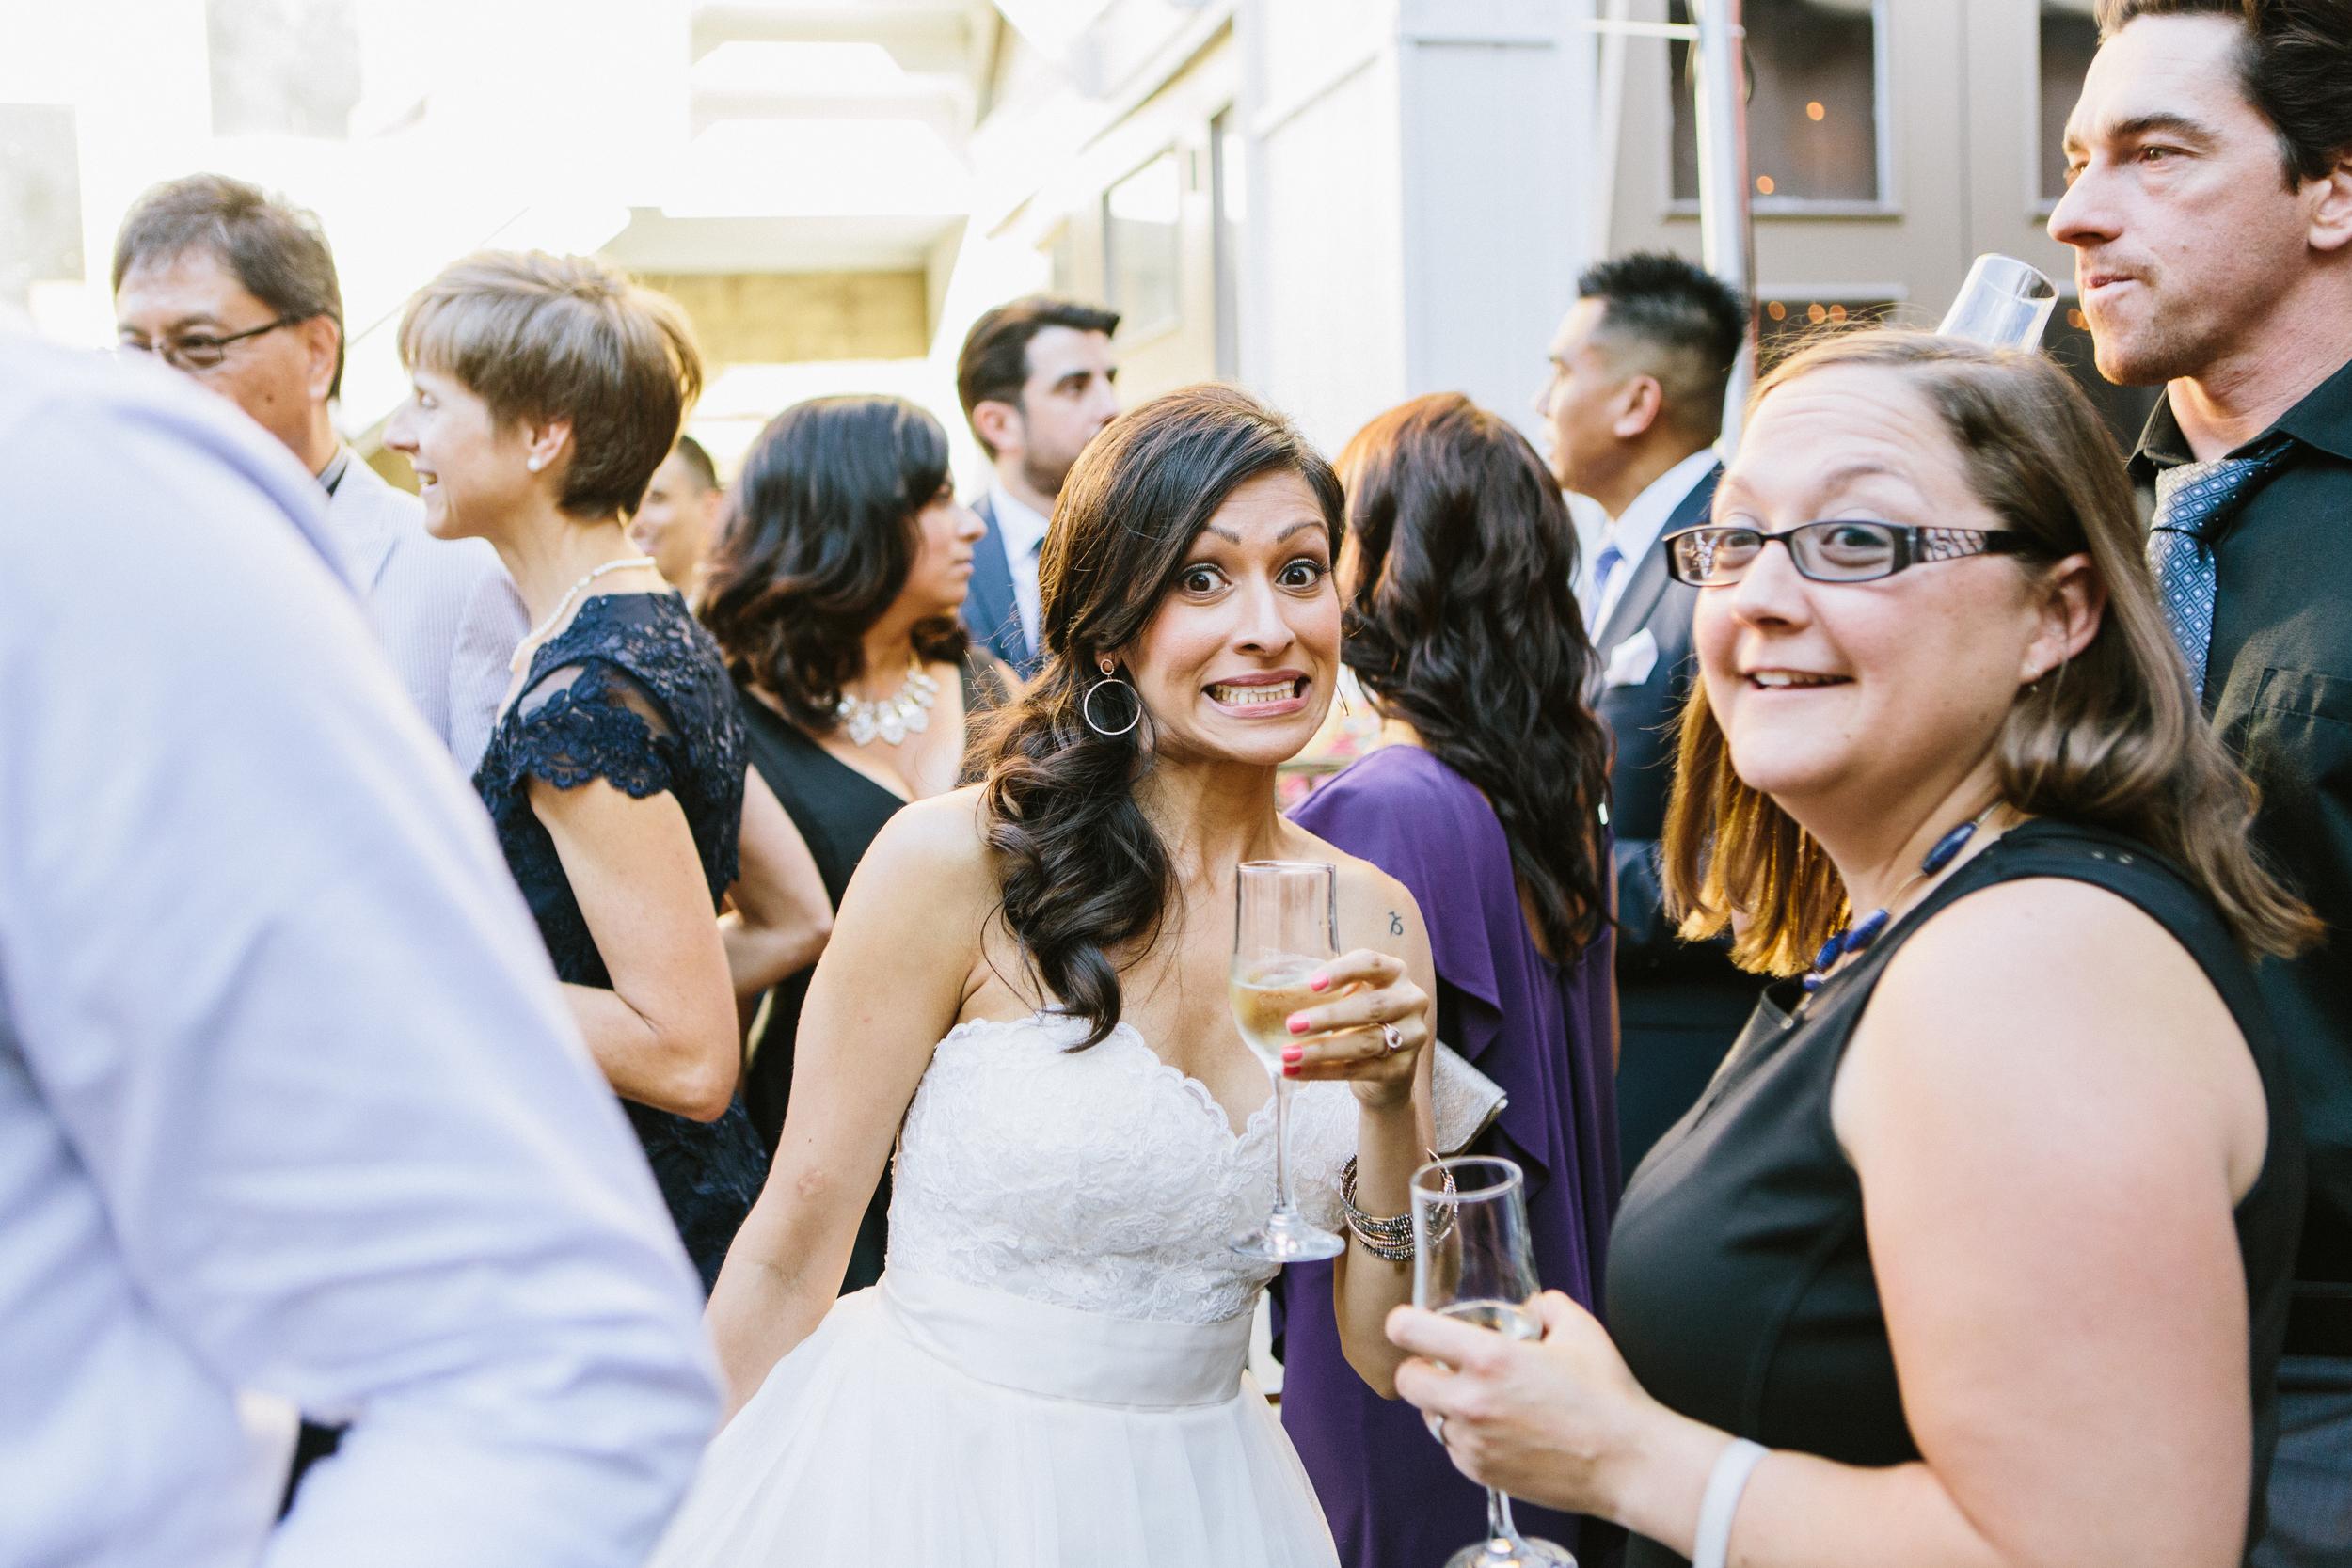 Berkeley-field-house-wedding-nicola-ken-069.jpg